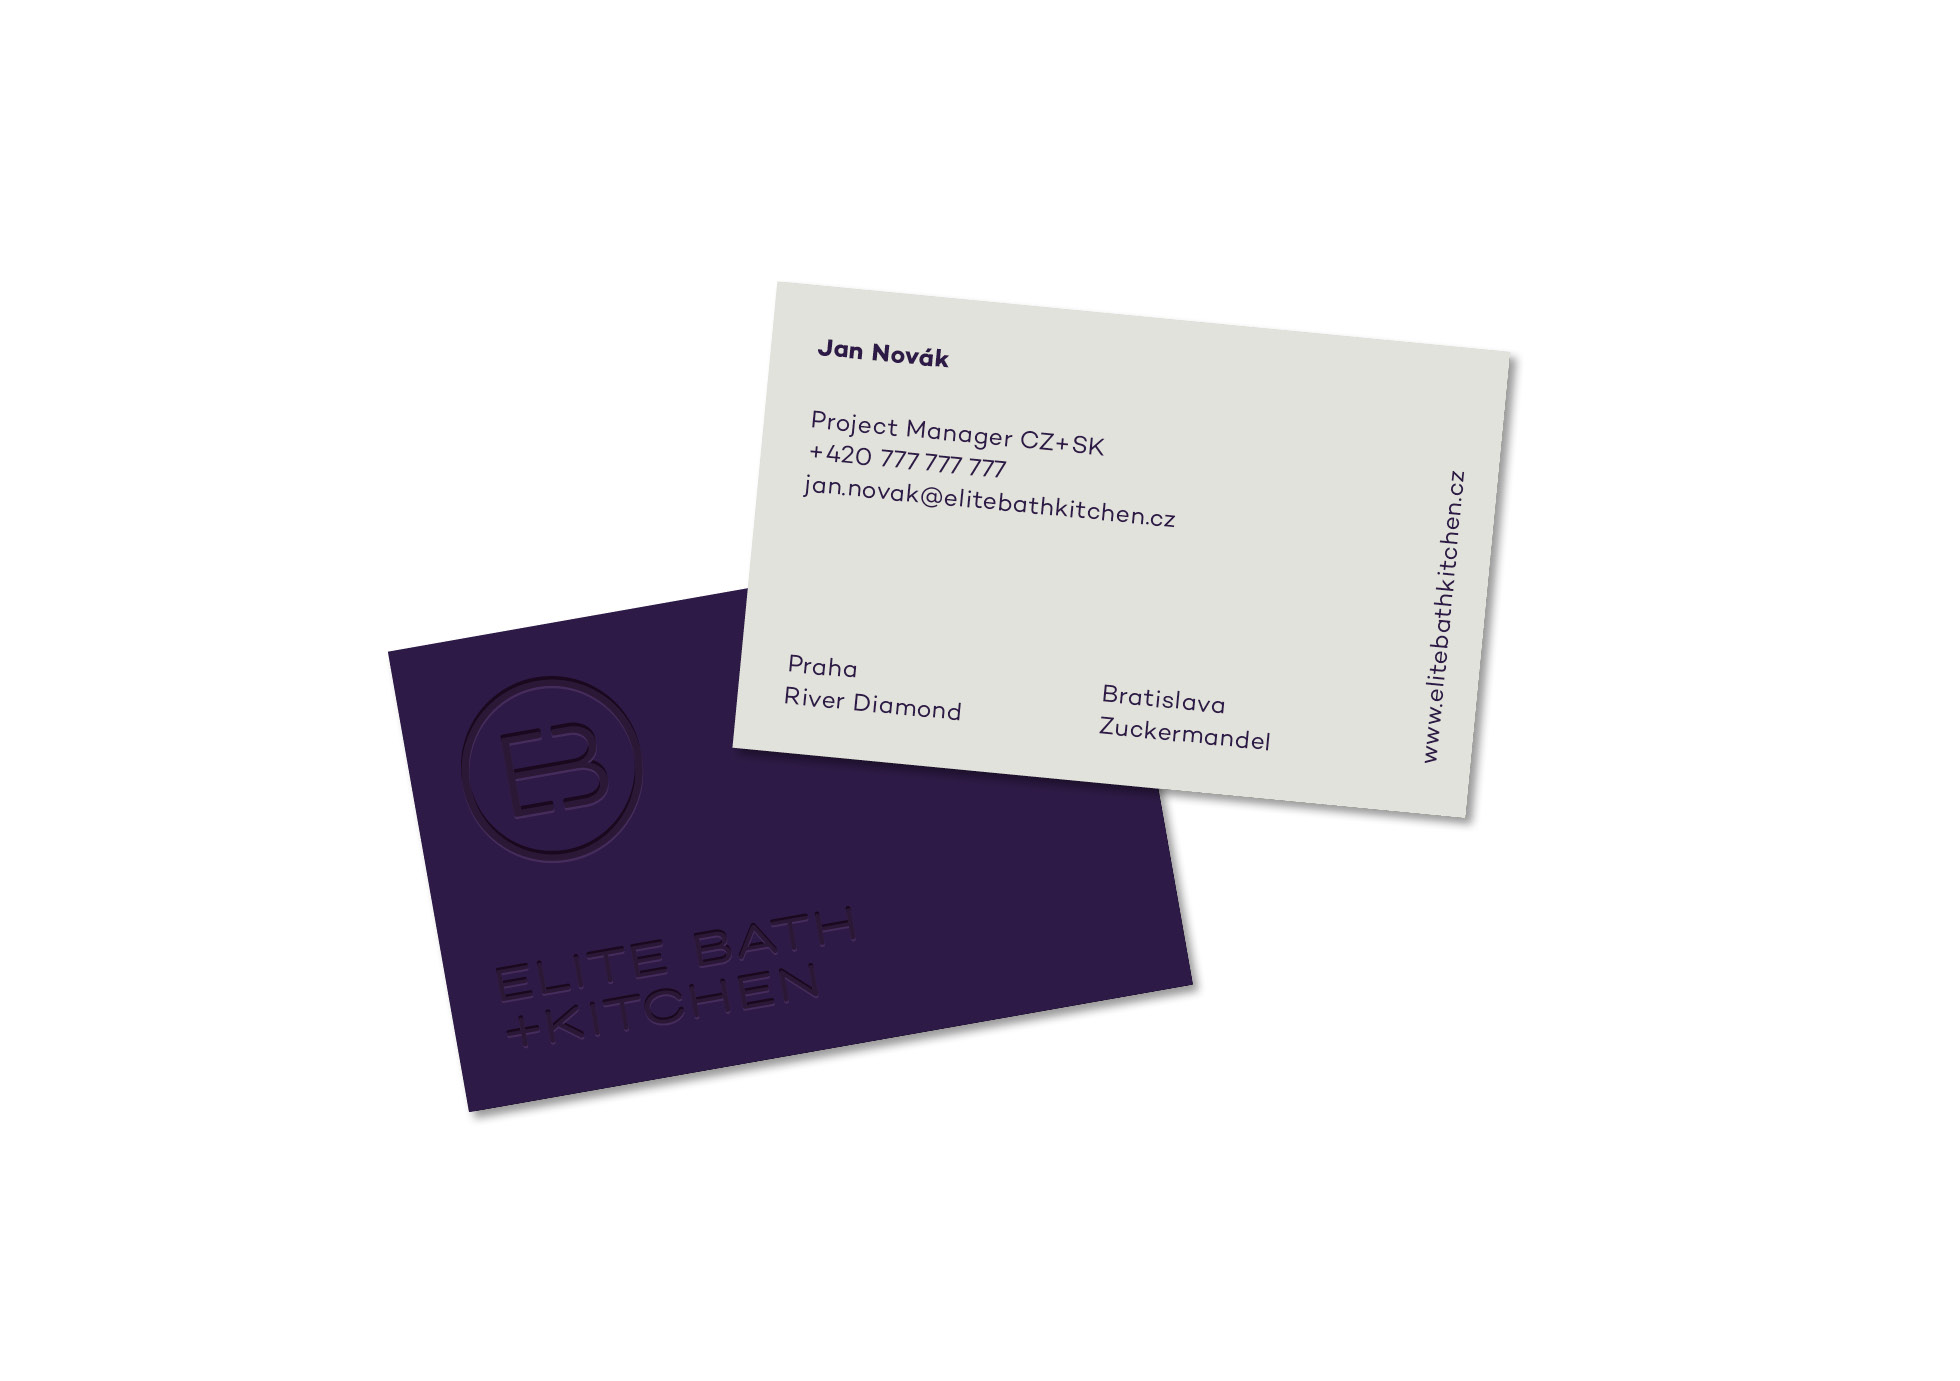 retail_EBK_business_card